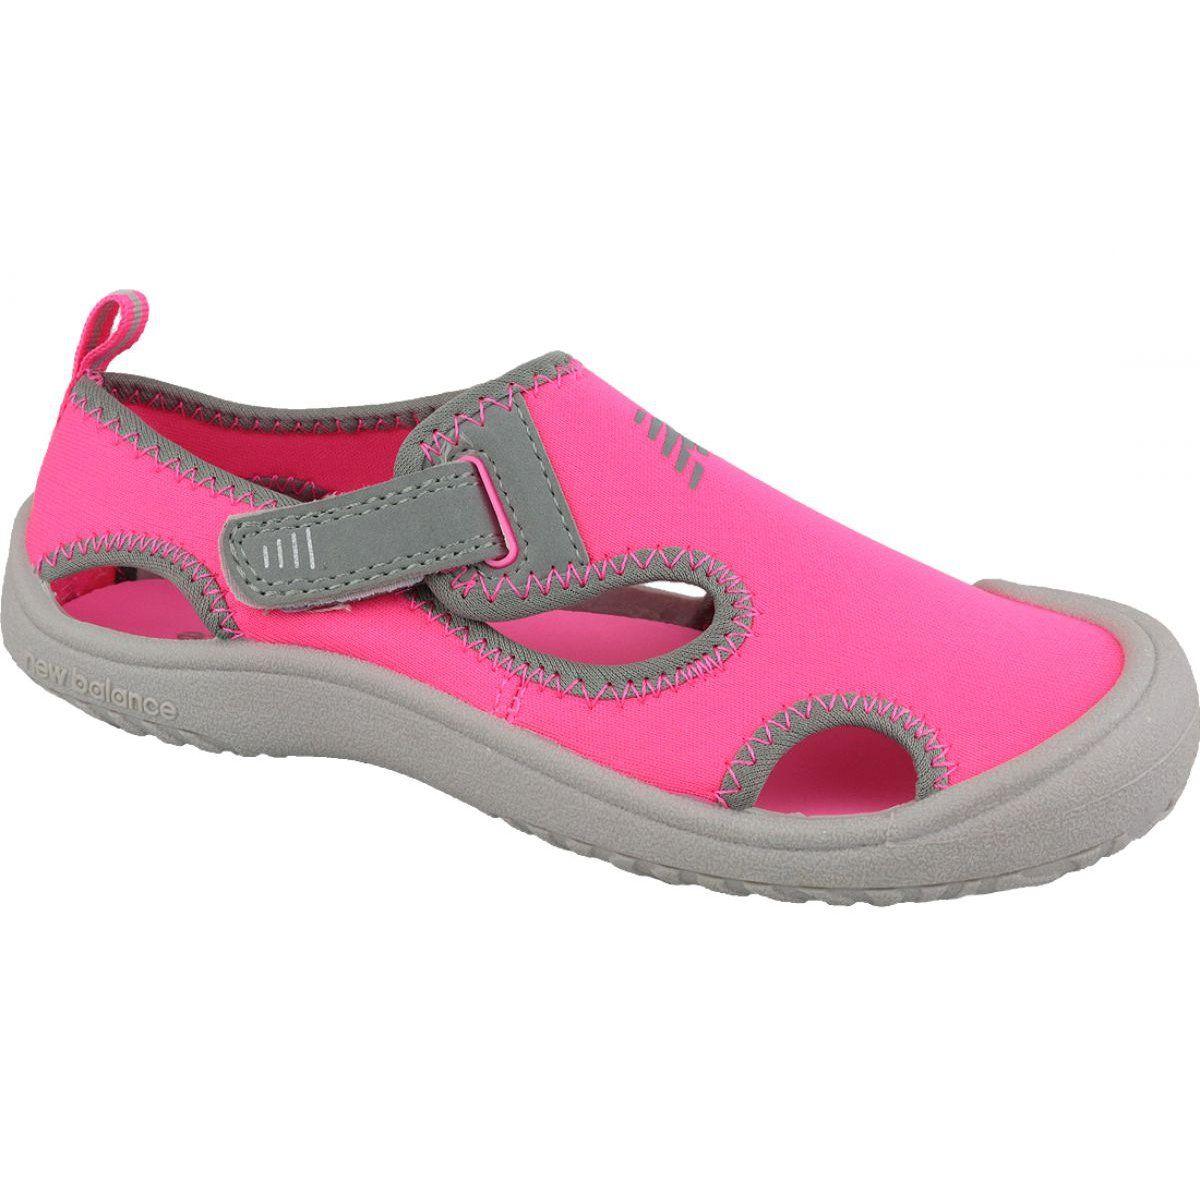 Sandaly New Balance Sandal K K2013pkg Rozowe New Balance Sandals Kid Shoes Blue Sandals